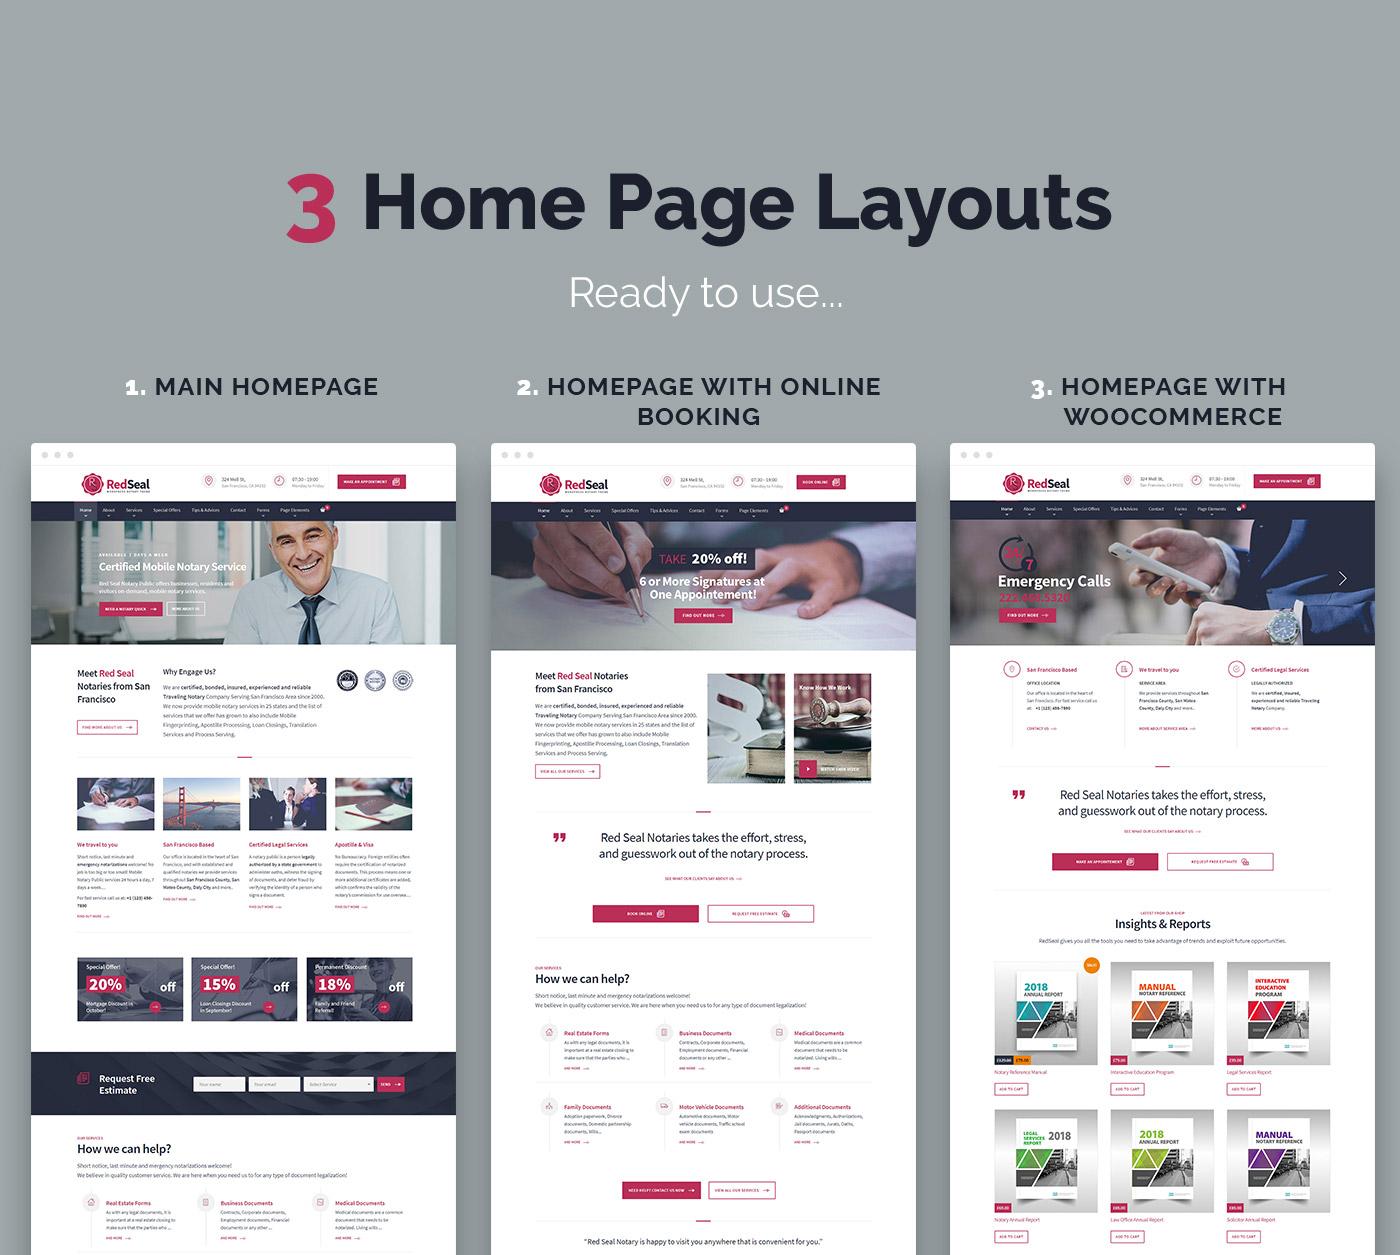 RedSeal HomePages